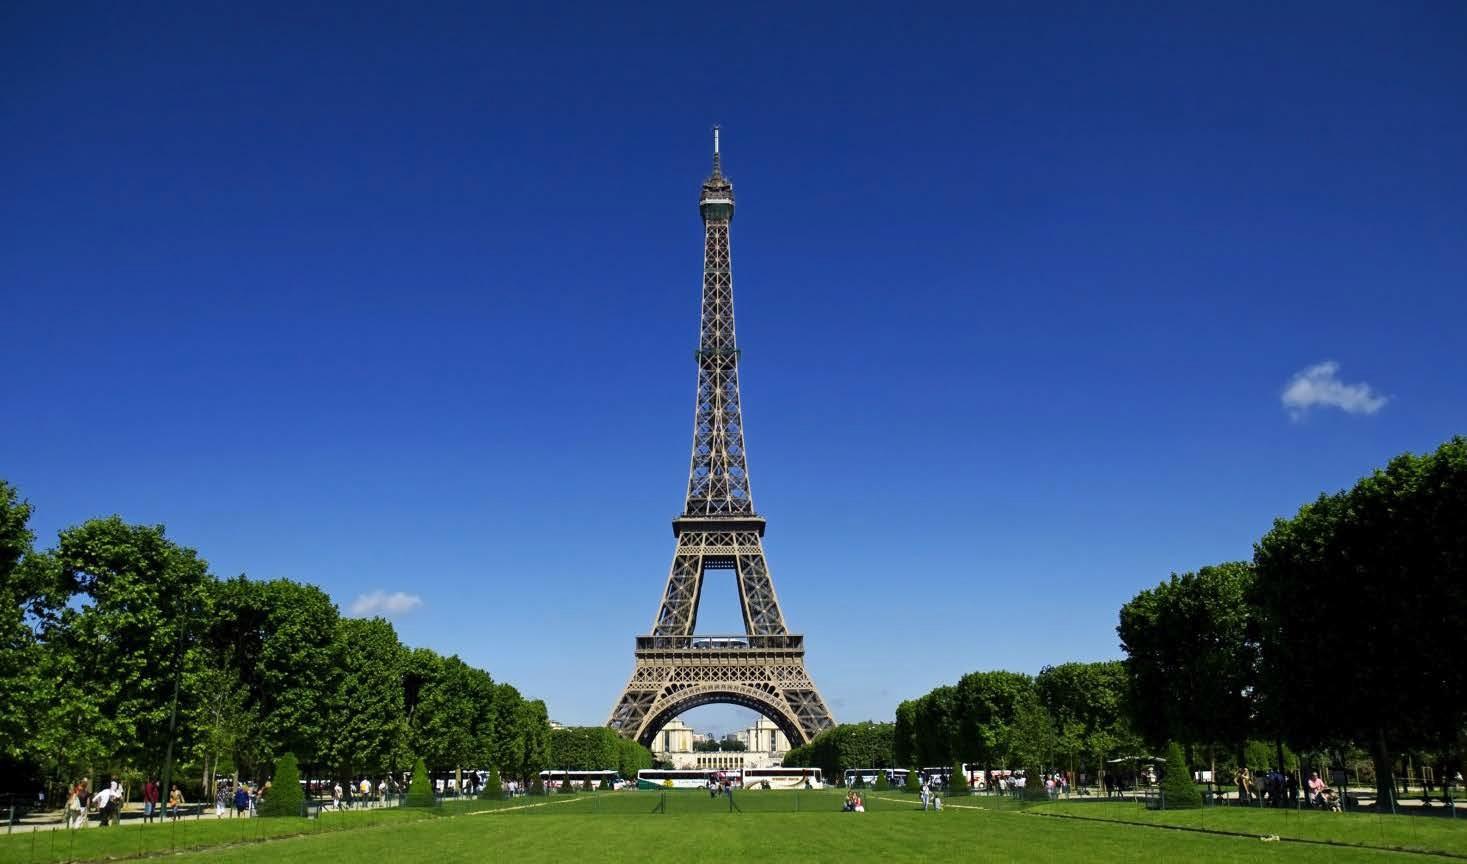 Séjour Paris Merveilles Disney1